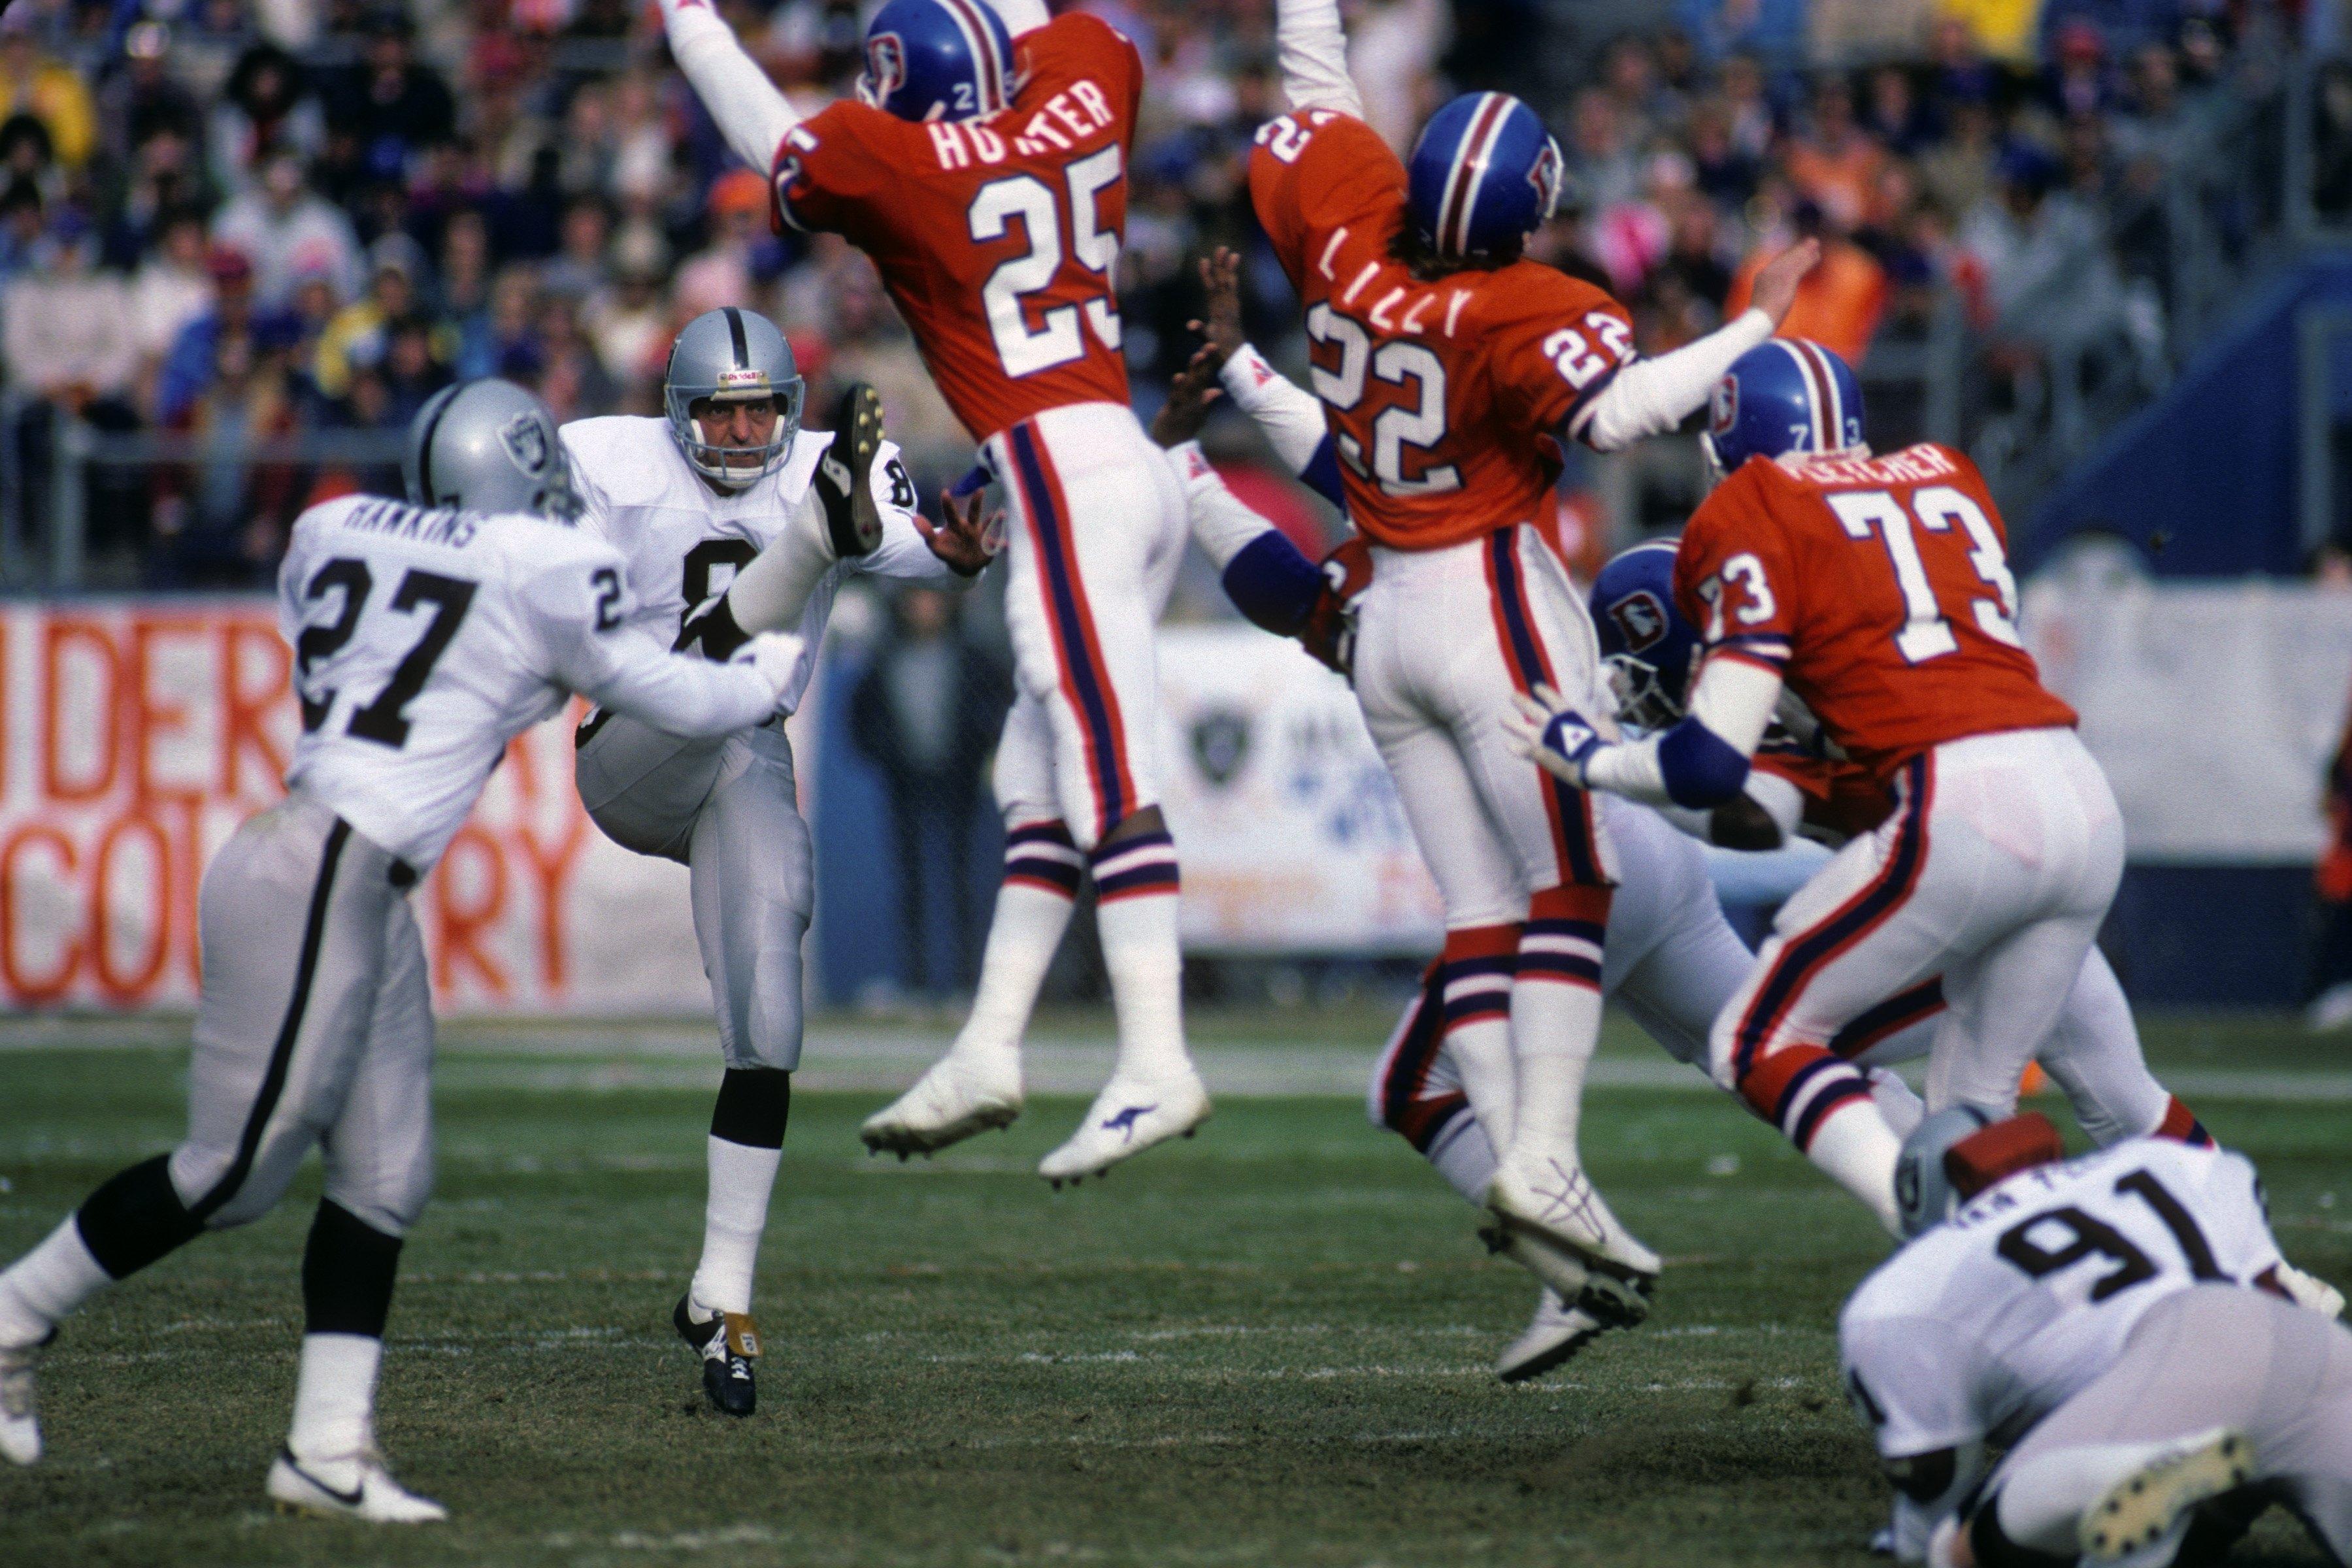 DENVER - DECEMBER 8:  Punter Ray Guy #8 of the Los Angeles Raiders kicks the ball away against defensive backs Daniel Hunter #25, Tony Lilly #22 and linebacker Simon Fletcher #73 of the Denver Broncos during the game at Mile High Stadium on December 8, 19